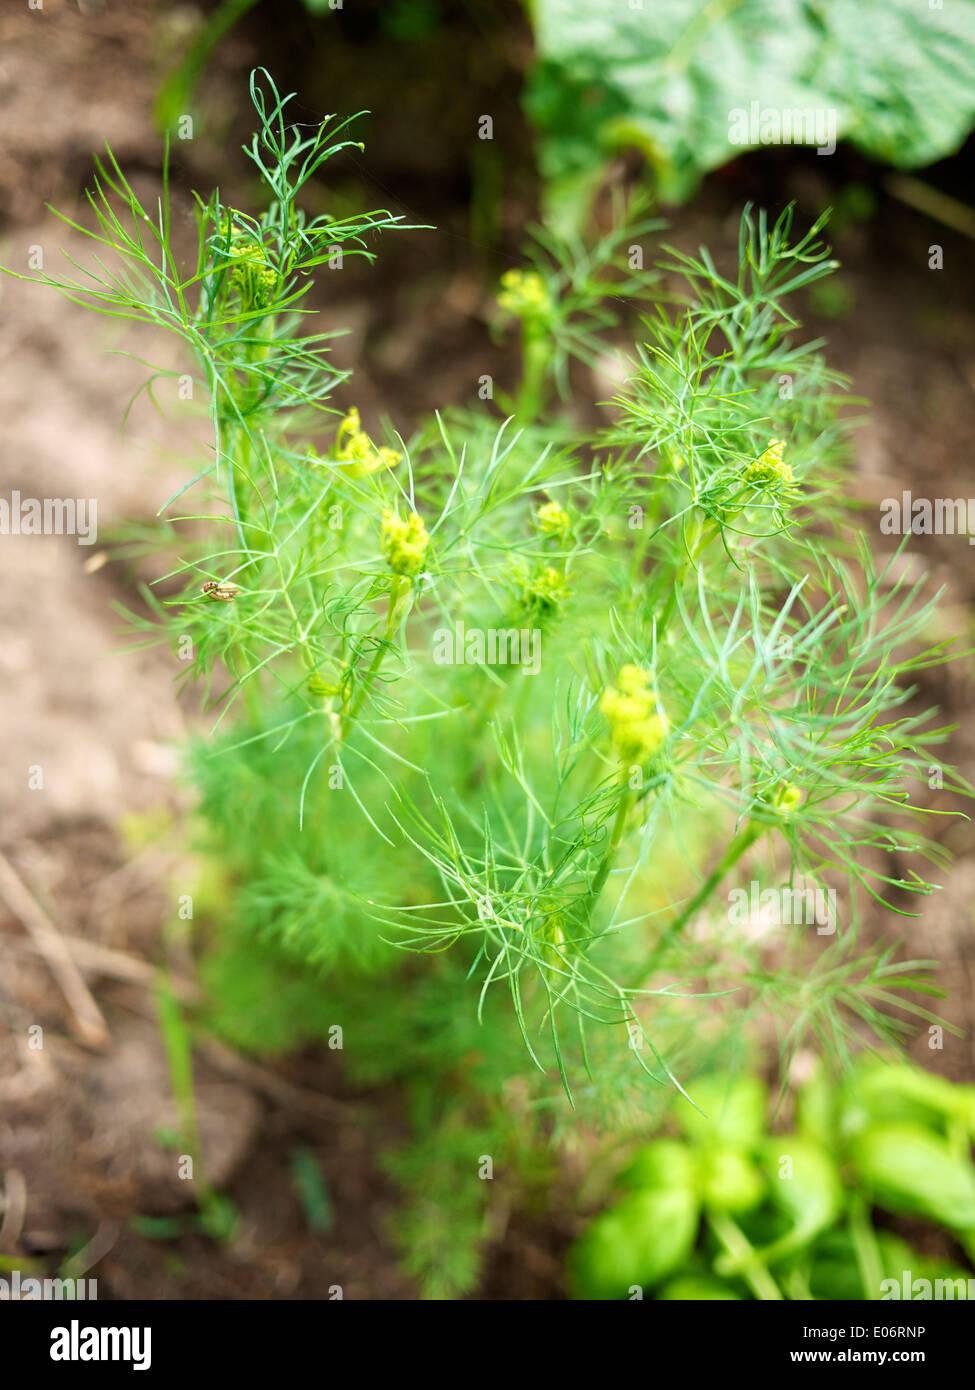 Dill (Anethum graveolens) in a garden. - Stock Image